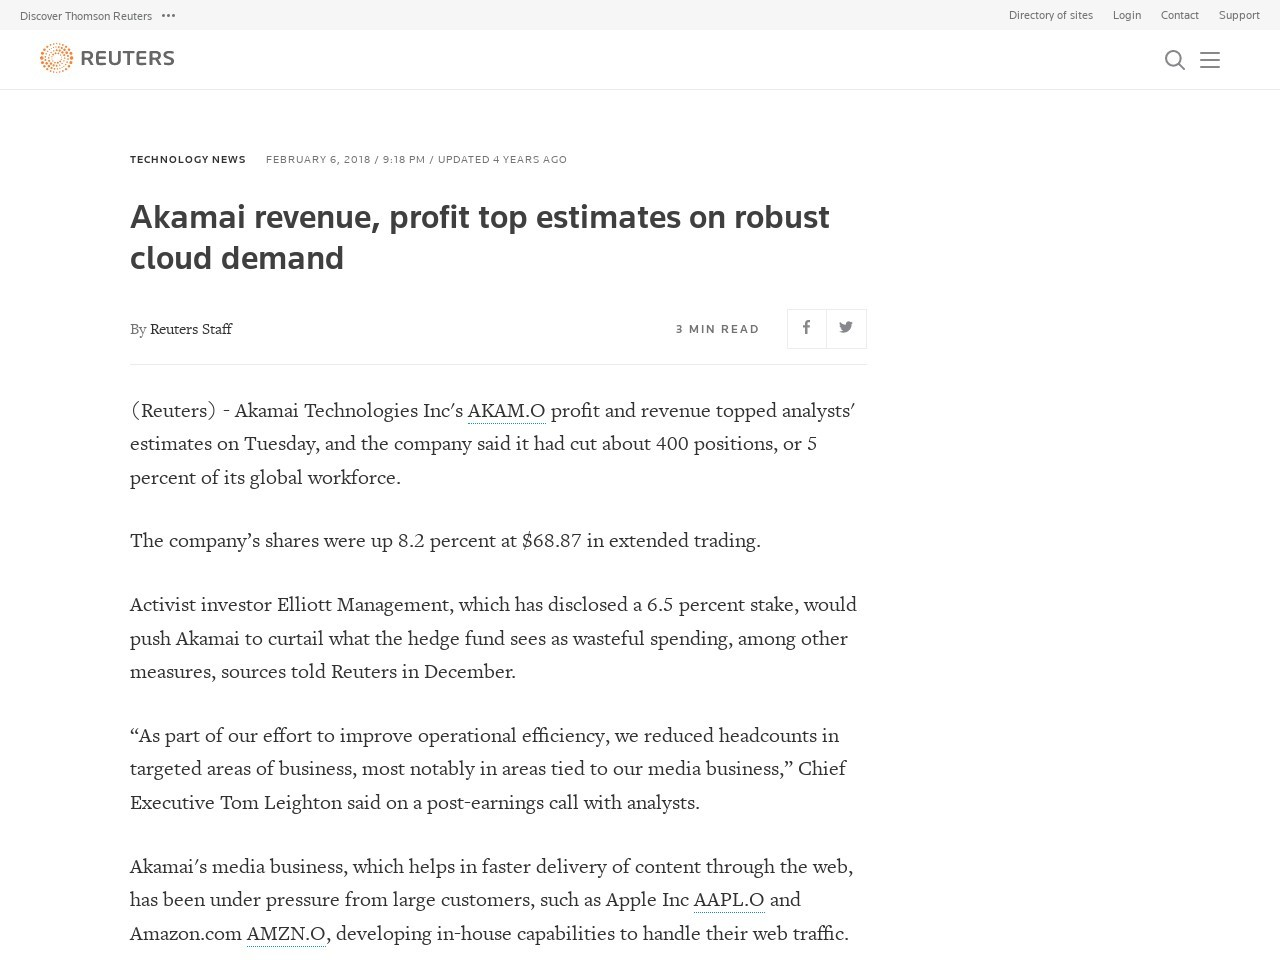 Akamai revenue, profit top estimates on robust cloud demand